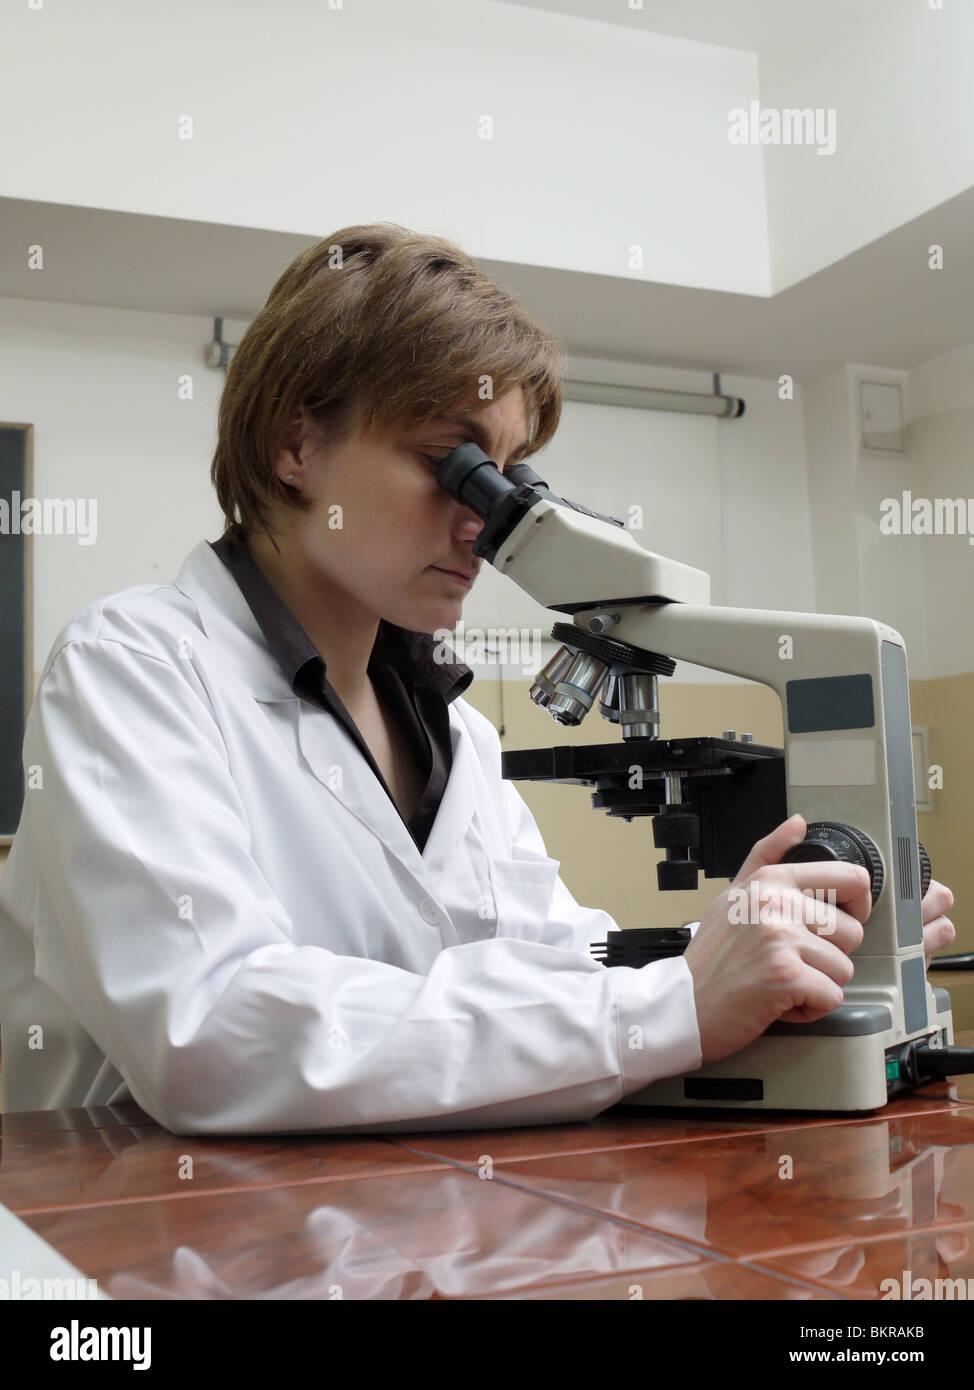 Female scientist analyzing specimen under the microscope - Stock Image